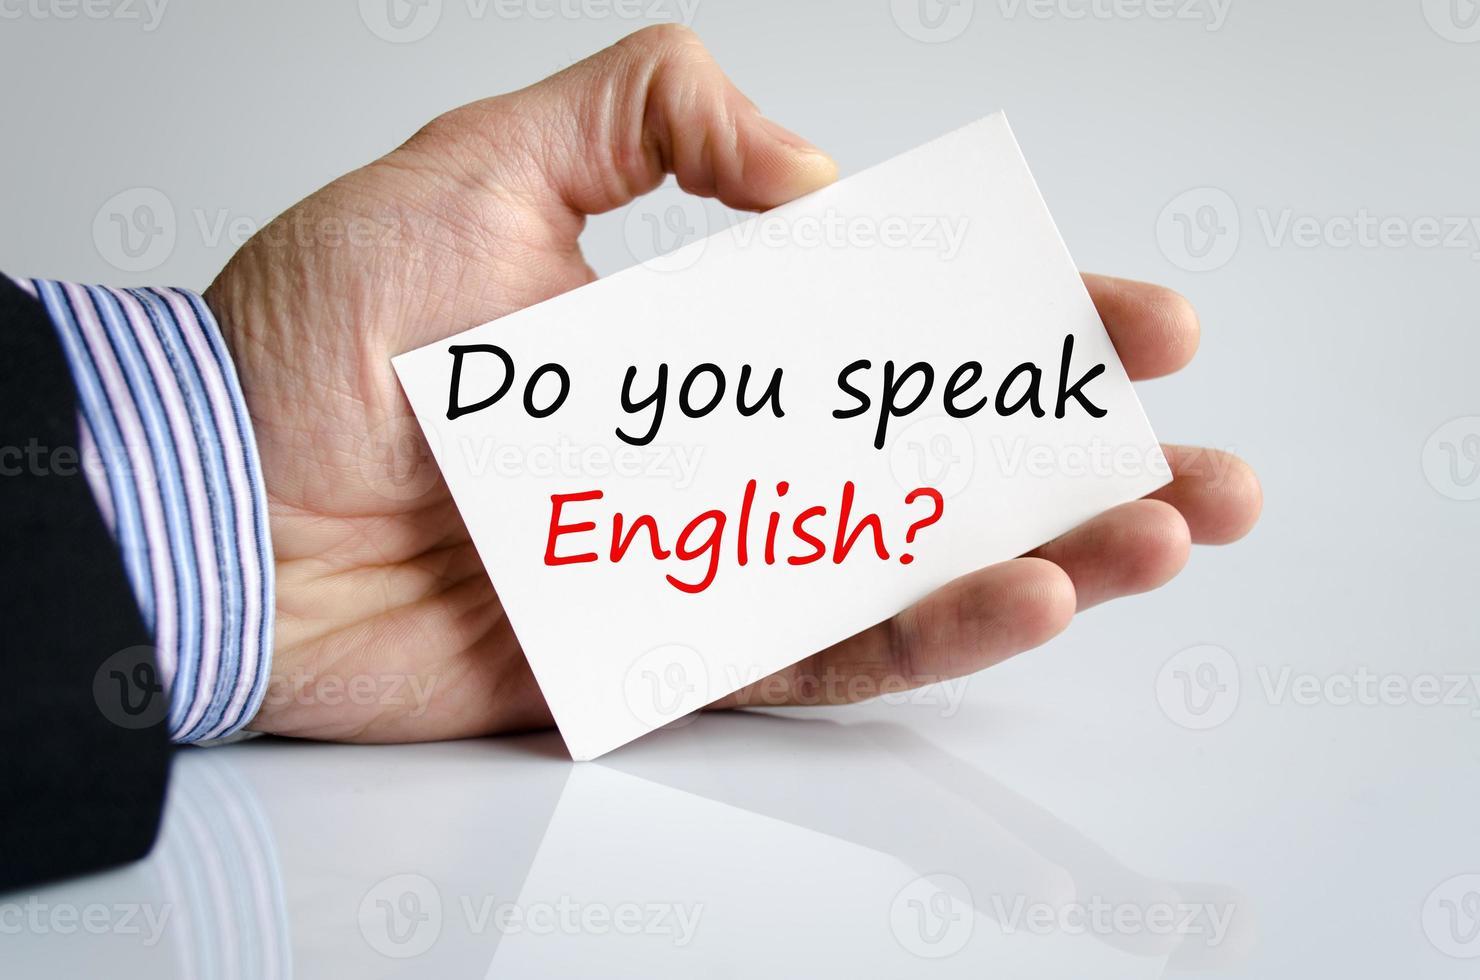 pratar du engelska?? foto